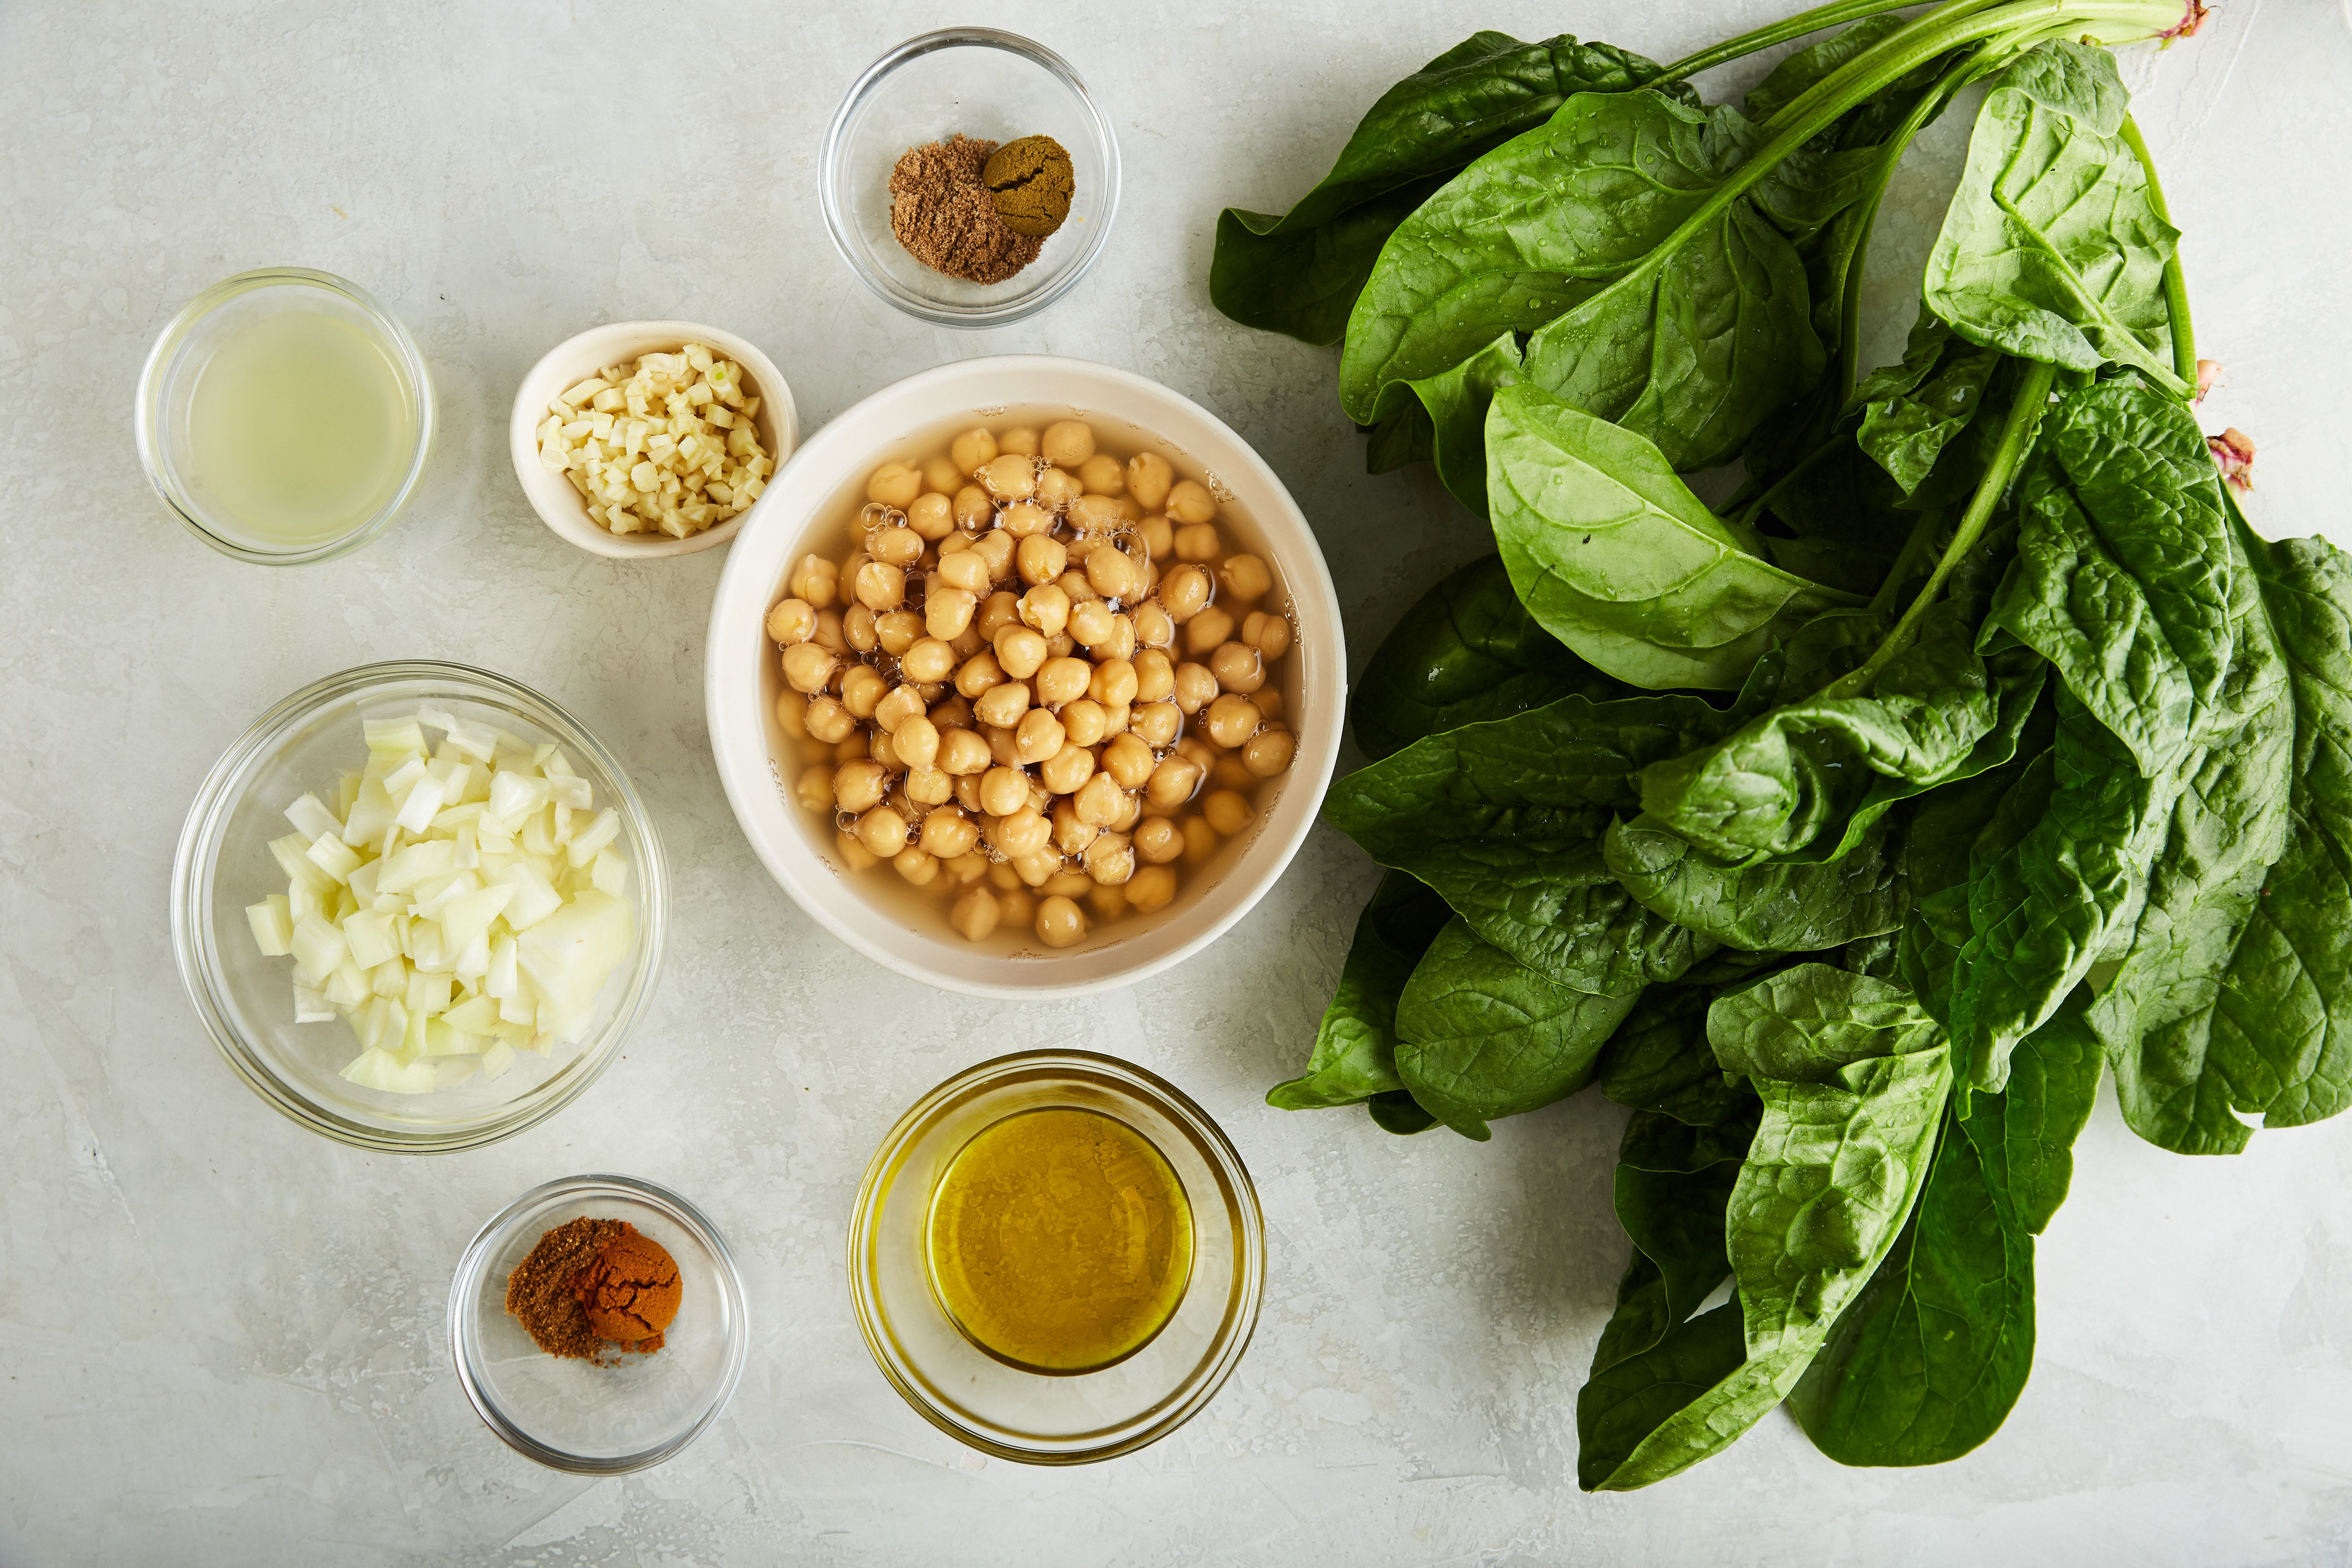 Ingredients for chana masala